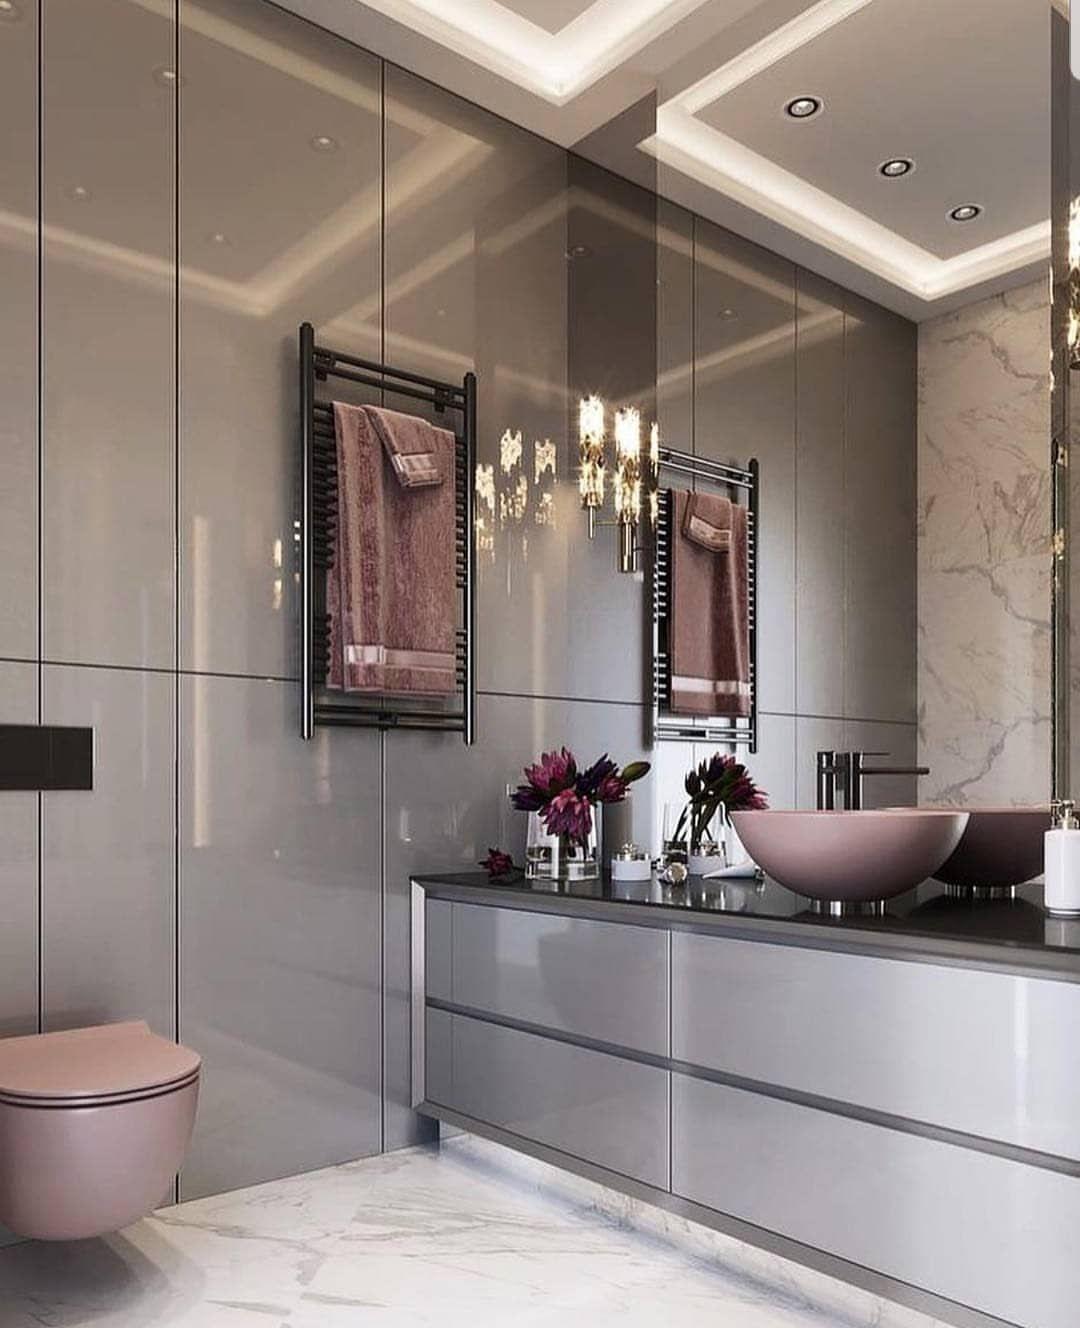 Credit Decoramundo Bathroomdesign Bathroom Interior Interiordecor Interio Badezimmer Innenausstattung Badezimmerideen Modernes Badezimmerdesign